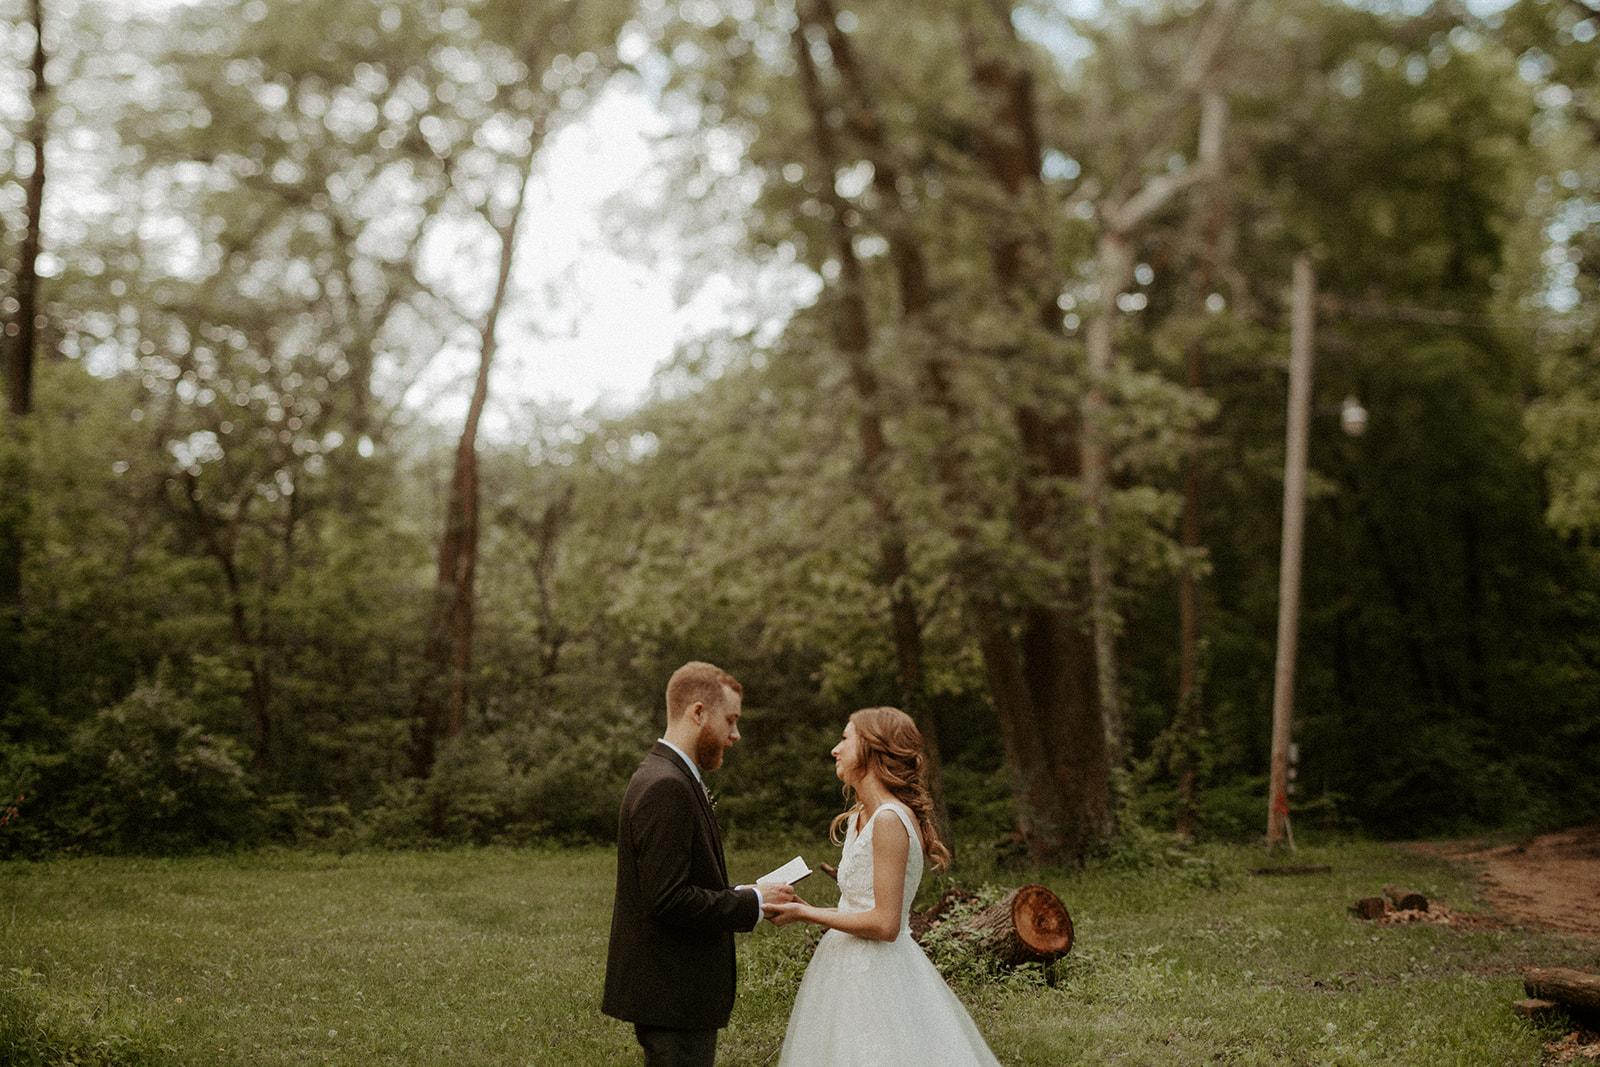 camp_wokanda_peoria_illinois_wedding_photographer_wright_photographs_bliese_0568.jpg